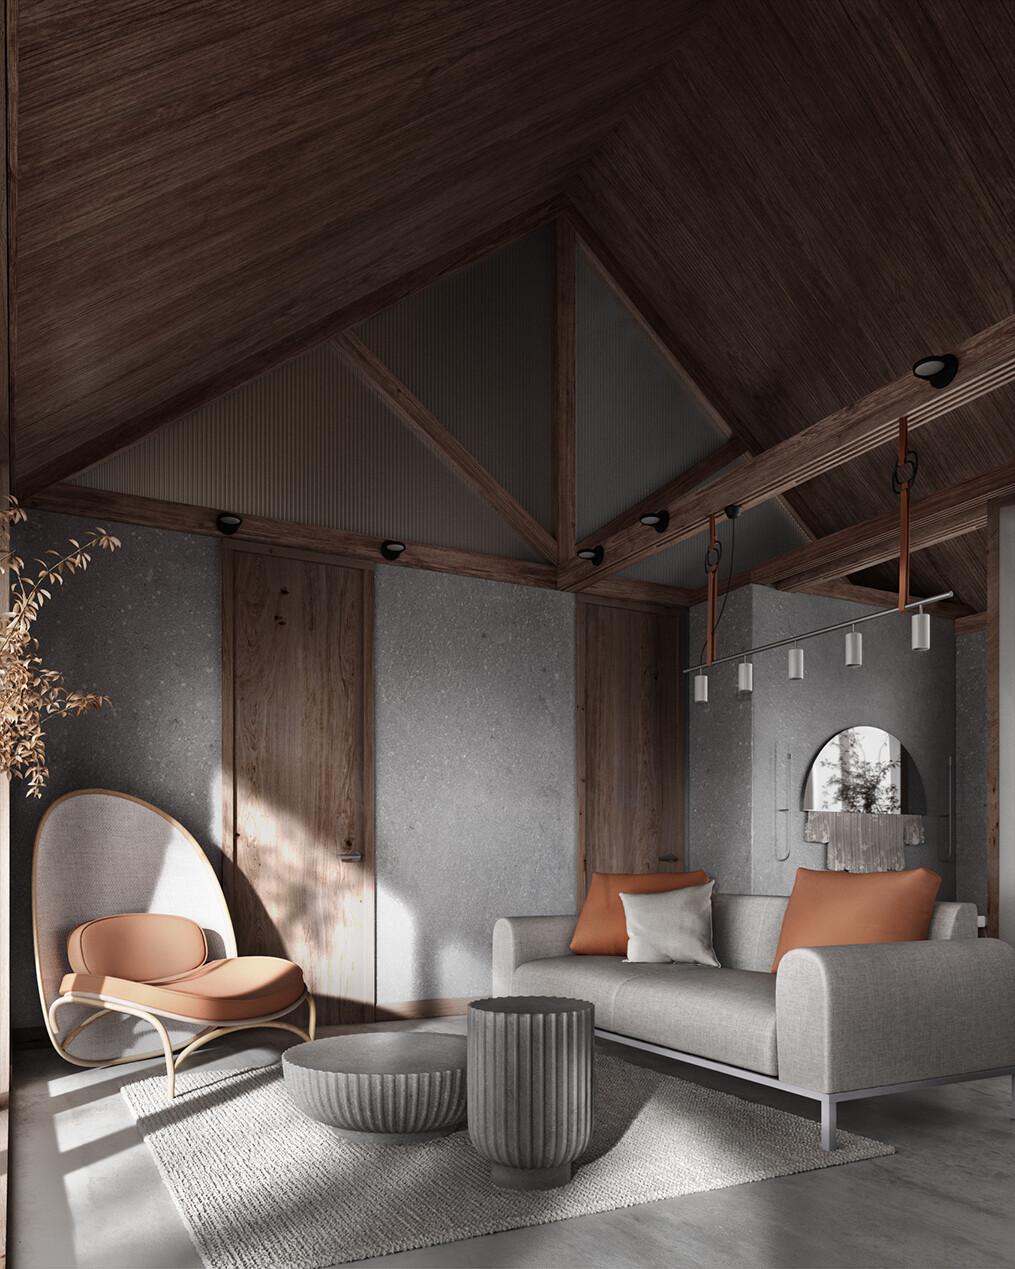 Interior_1_in_japandi style